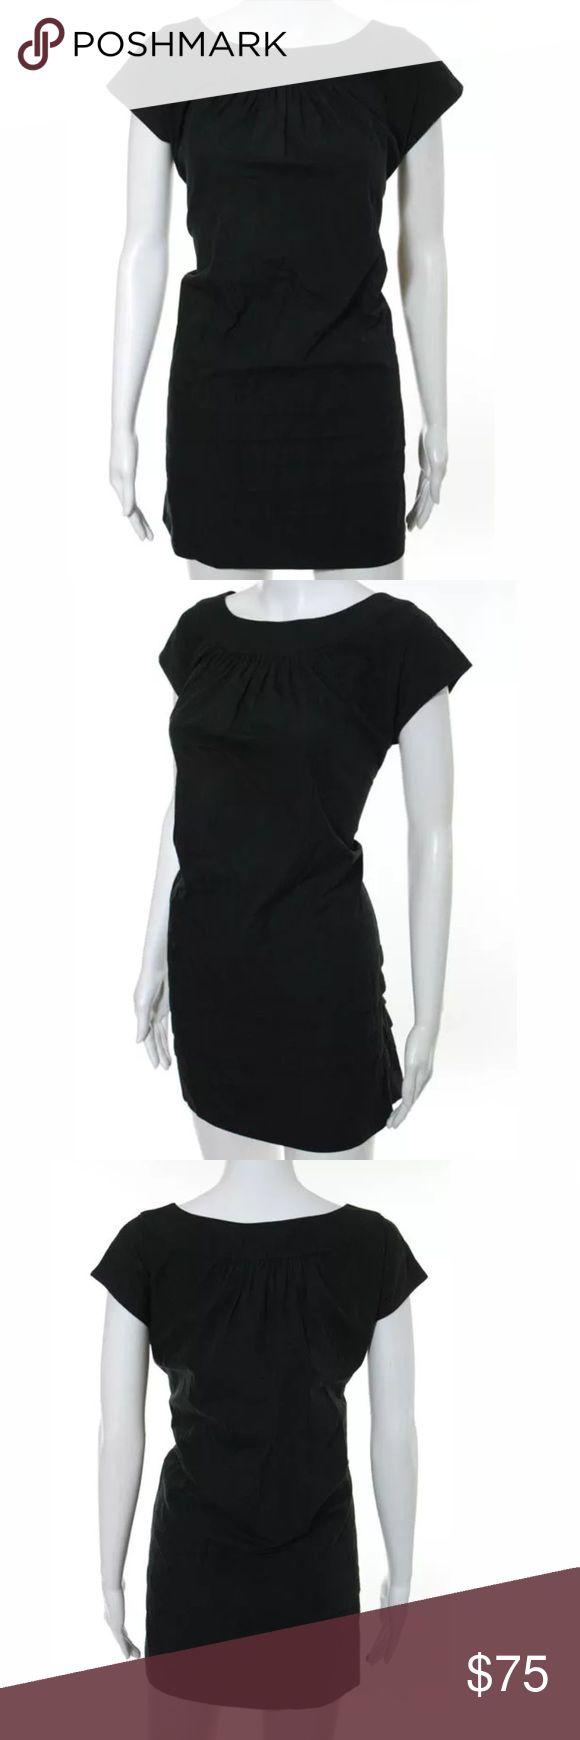 Sari Gueron black mini dress Sz 4 Cotton blend mini dress in black Sari Gueron Dresses Mini